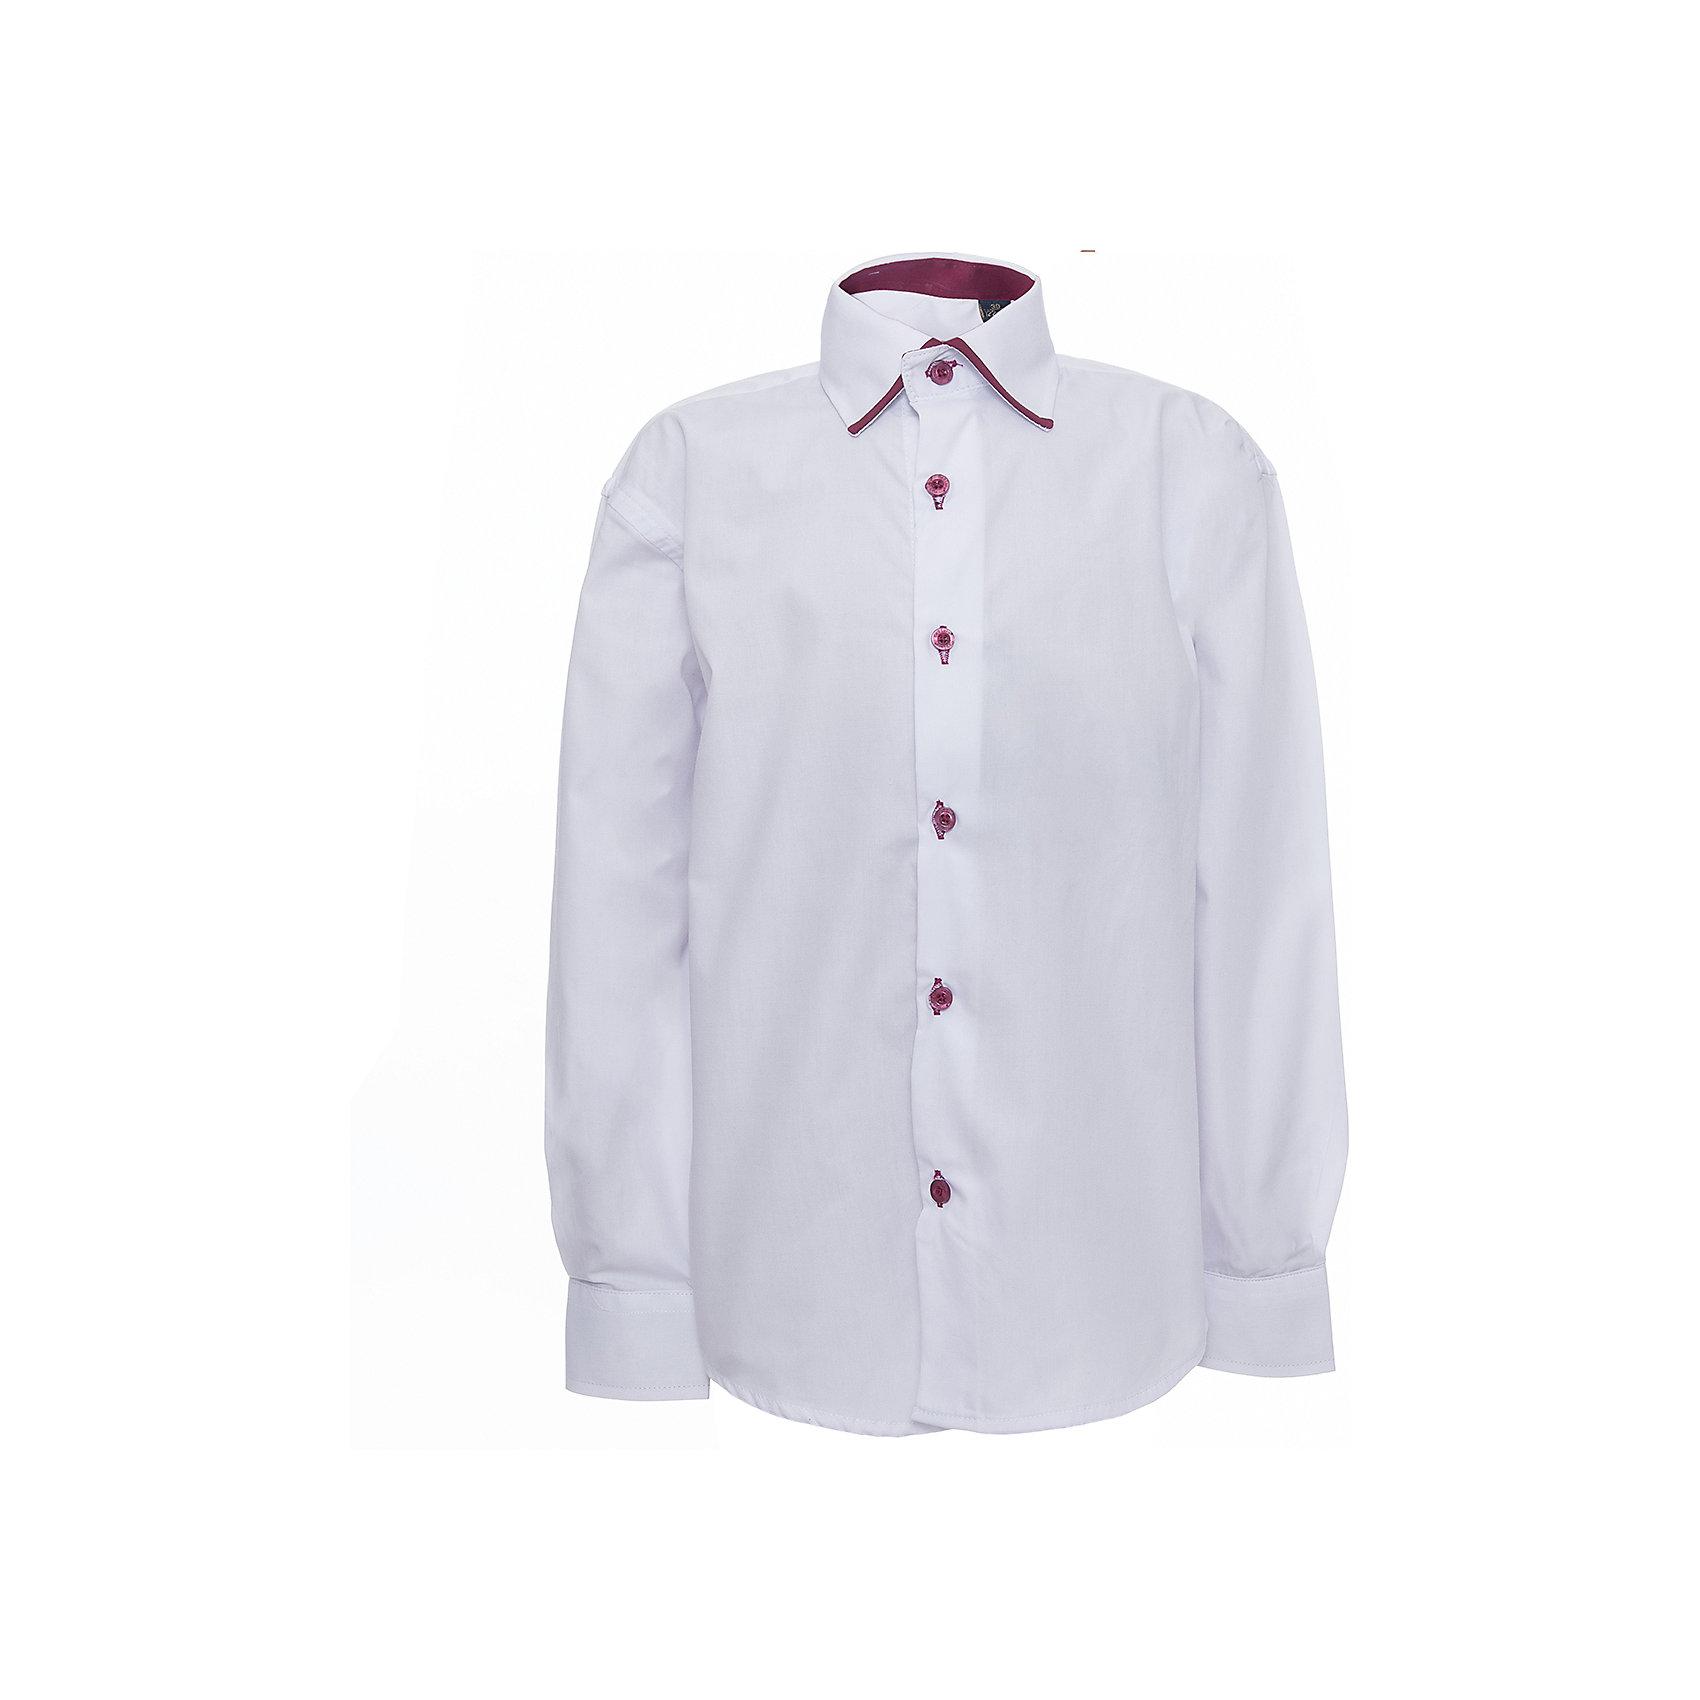 Рубашка для мальчика PREMIUM SkylakeБлузки и рубашки<br>Рубашка для мальчика PREMIUM от известного бренда Skylake.<br>Состав:<br>80%хлопок 20%п/э<br><br>Ширина мм: 174<br>Глубина мм: 10<br>Высота мм: 169<br>Вес г: 157<br>Цвет: белый<br>Возраст от месяцев: 144<br>Возраст до месяцев: 156<br>Пол: Мужской<br>Возраст: Детский<br>Размер: 158,128,122,140,152,146,134<br>SKU: 4710141